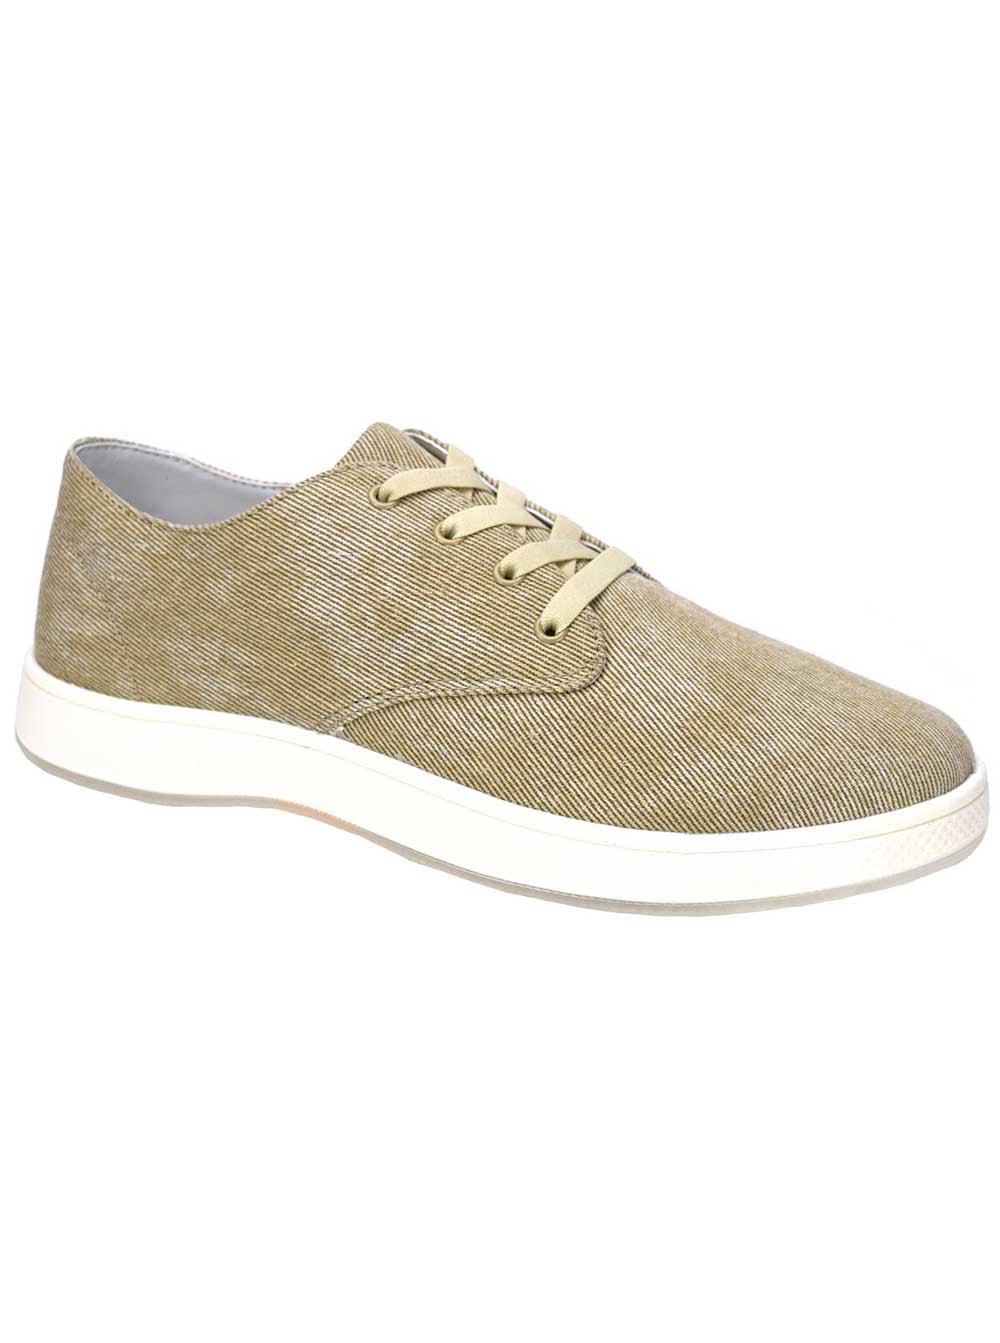 Aureus Men's Dayton Khaki Sneakers 10 M US